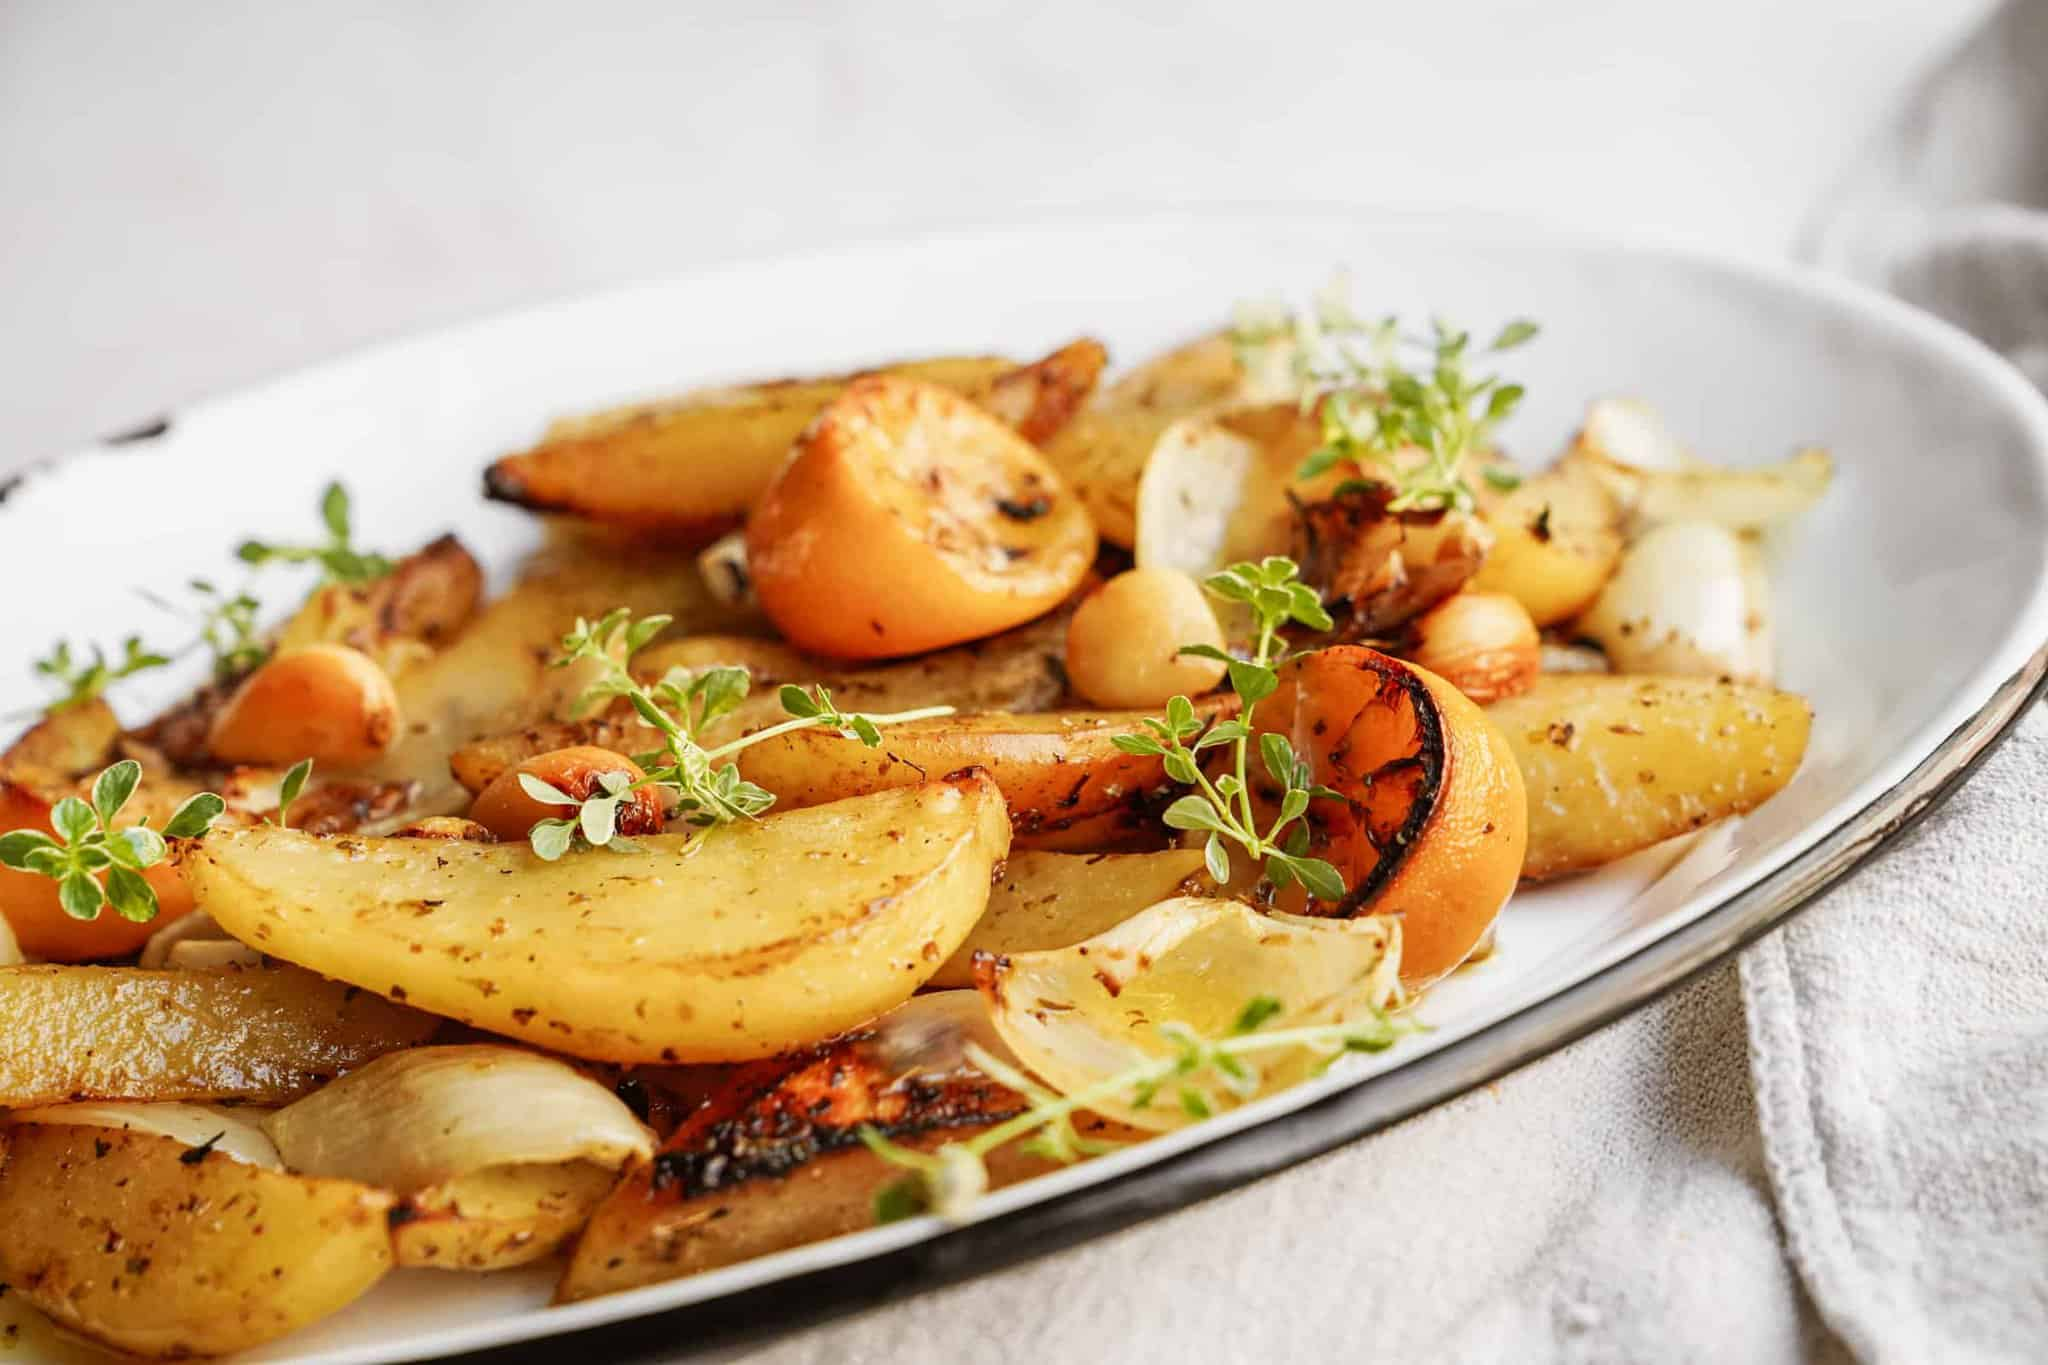 Tray of Greek style potatoes